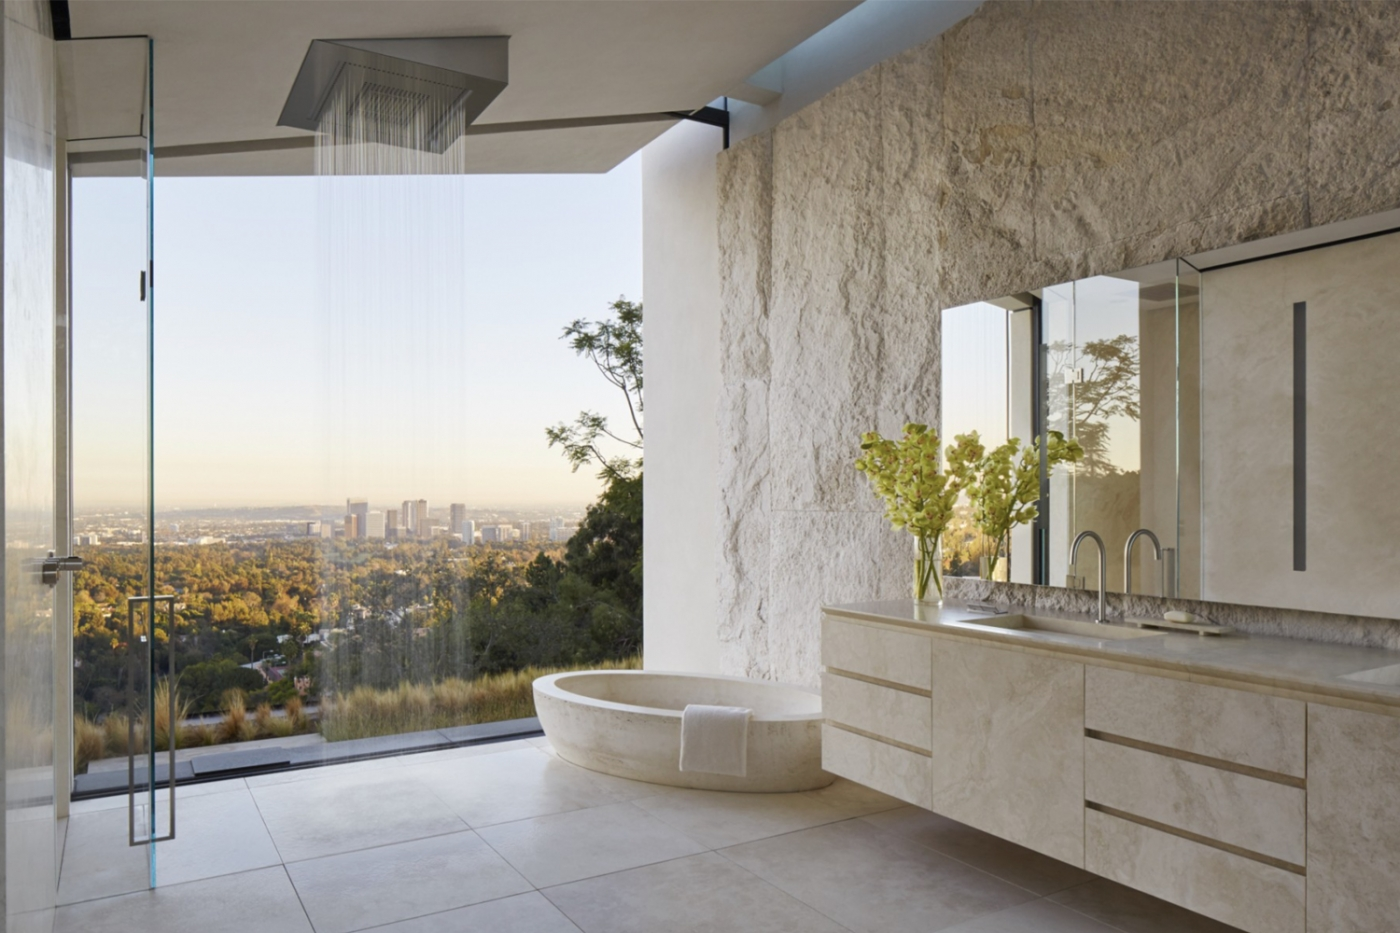 Lynda Murray, interior design, interior designer, los angeles, california, james cameron, michael bay, hollywood, residence, modern design, luxury interiors, la